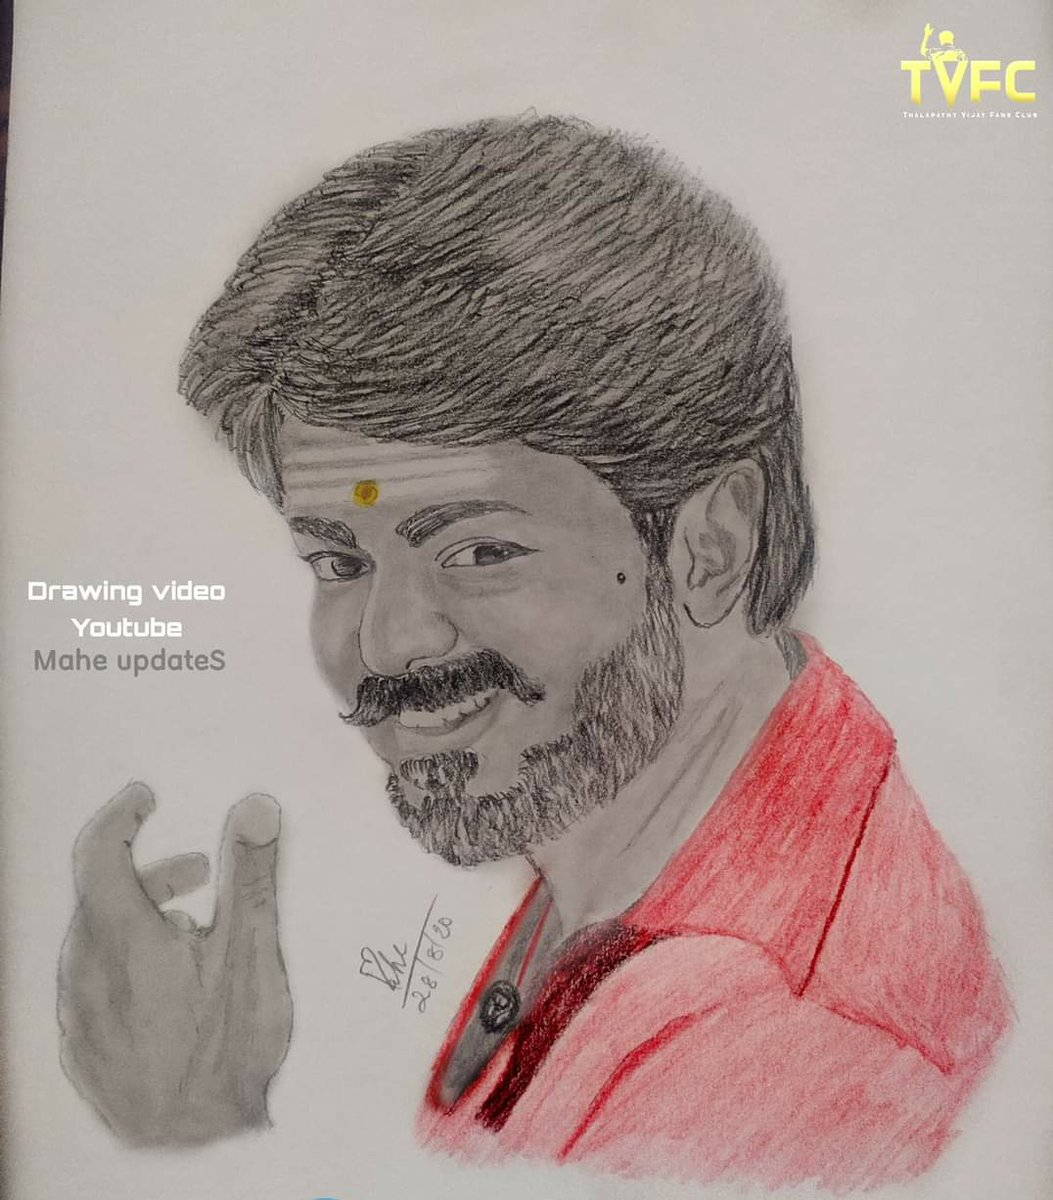 Creative Designers Team On Twitter Pencil Colour Pencil Drawing Thalapathyvijay Drawing By Mahendravj Master Actorvijay